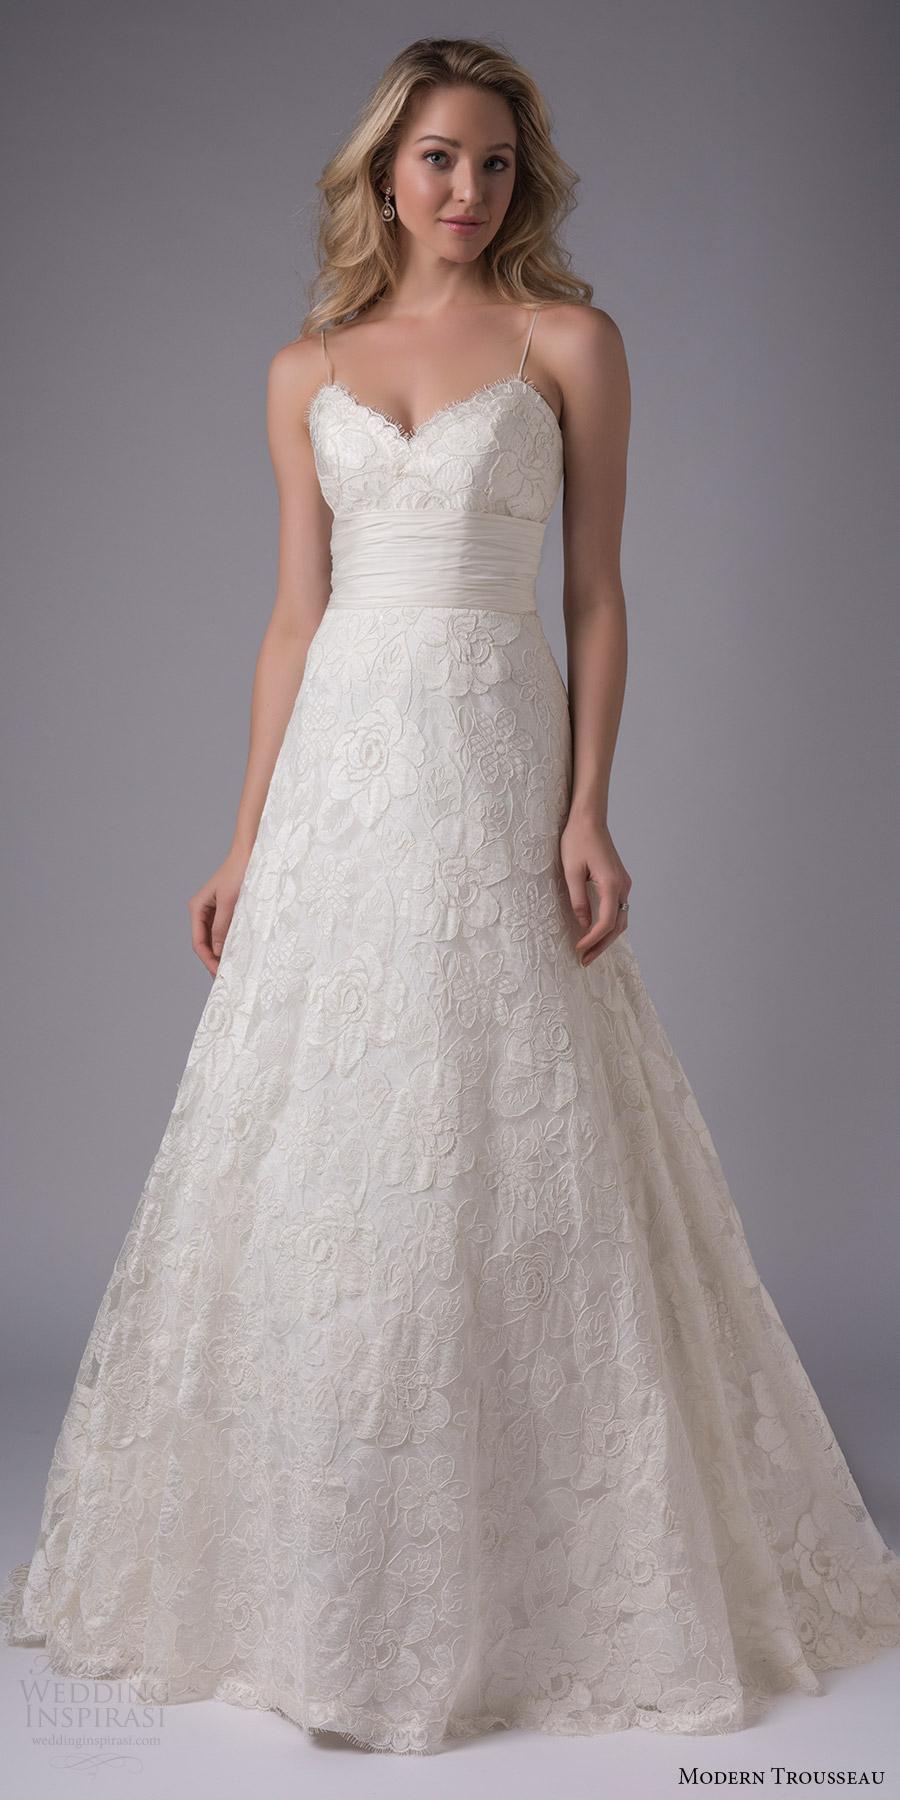 modern trousseau bridal fall 2017 sleeveless sweetheart ball gown alencon lace awedding dress (blaine) mv ruched waist